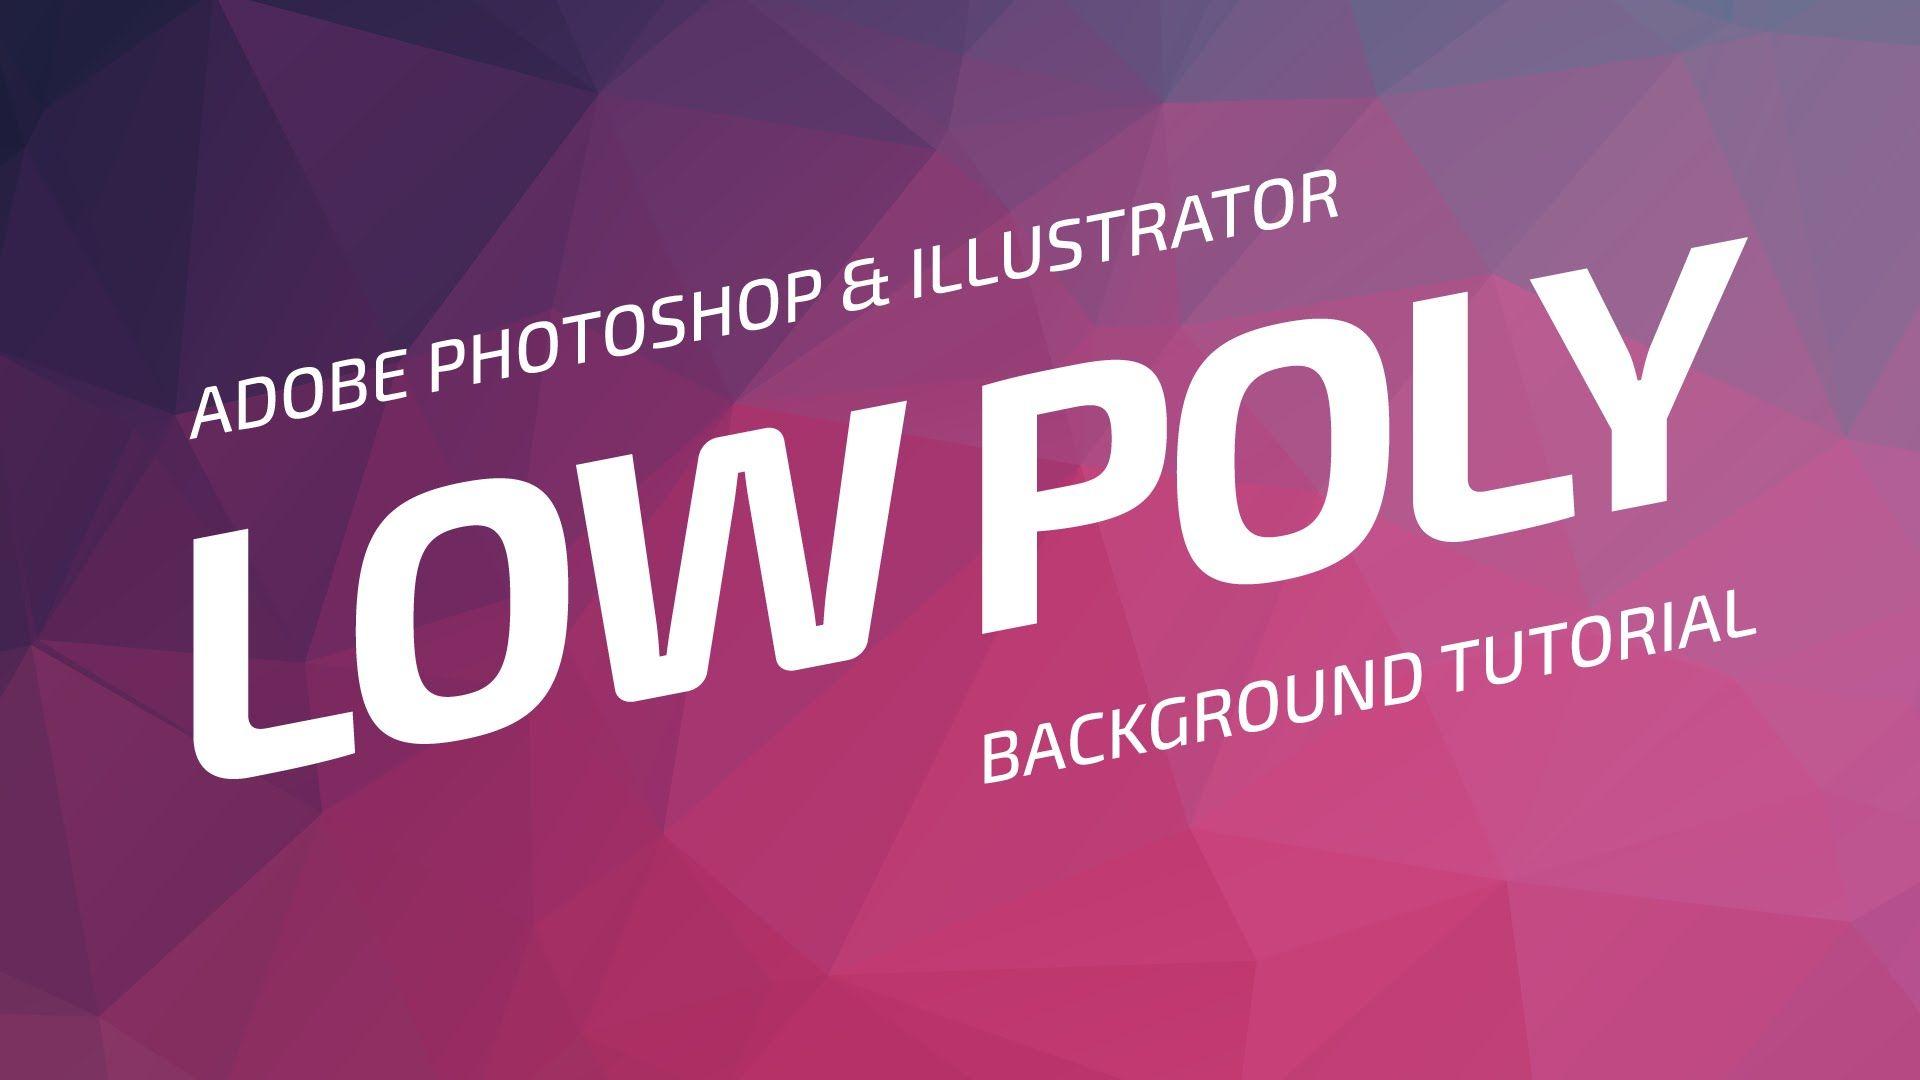 Low poly background tutorial adobe photoshop illustrator low poly background tutorial adobe photoshop illustrator baditri Image collections